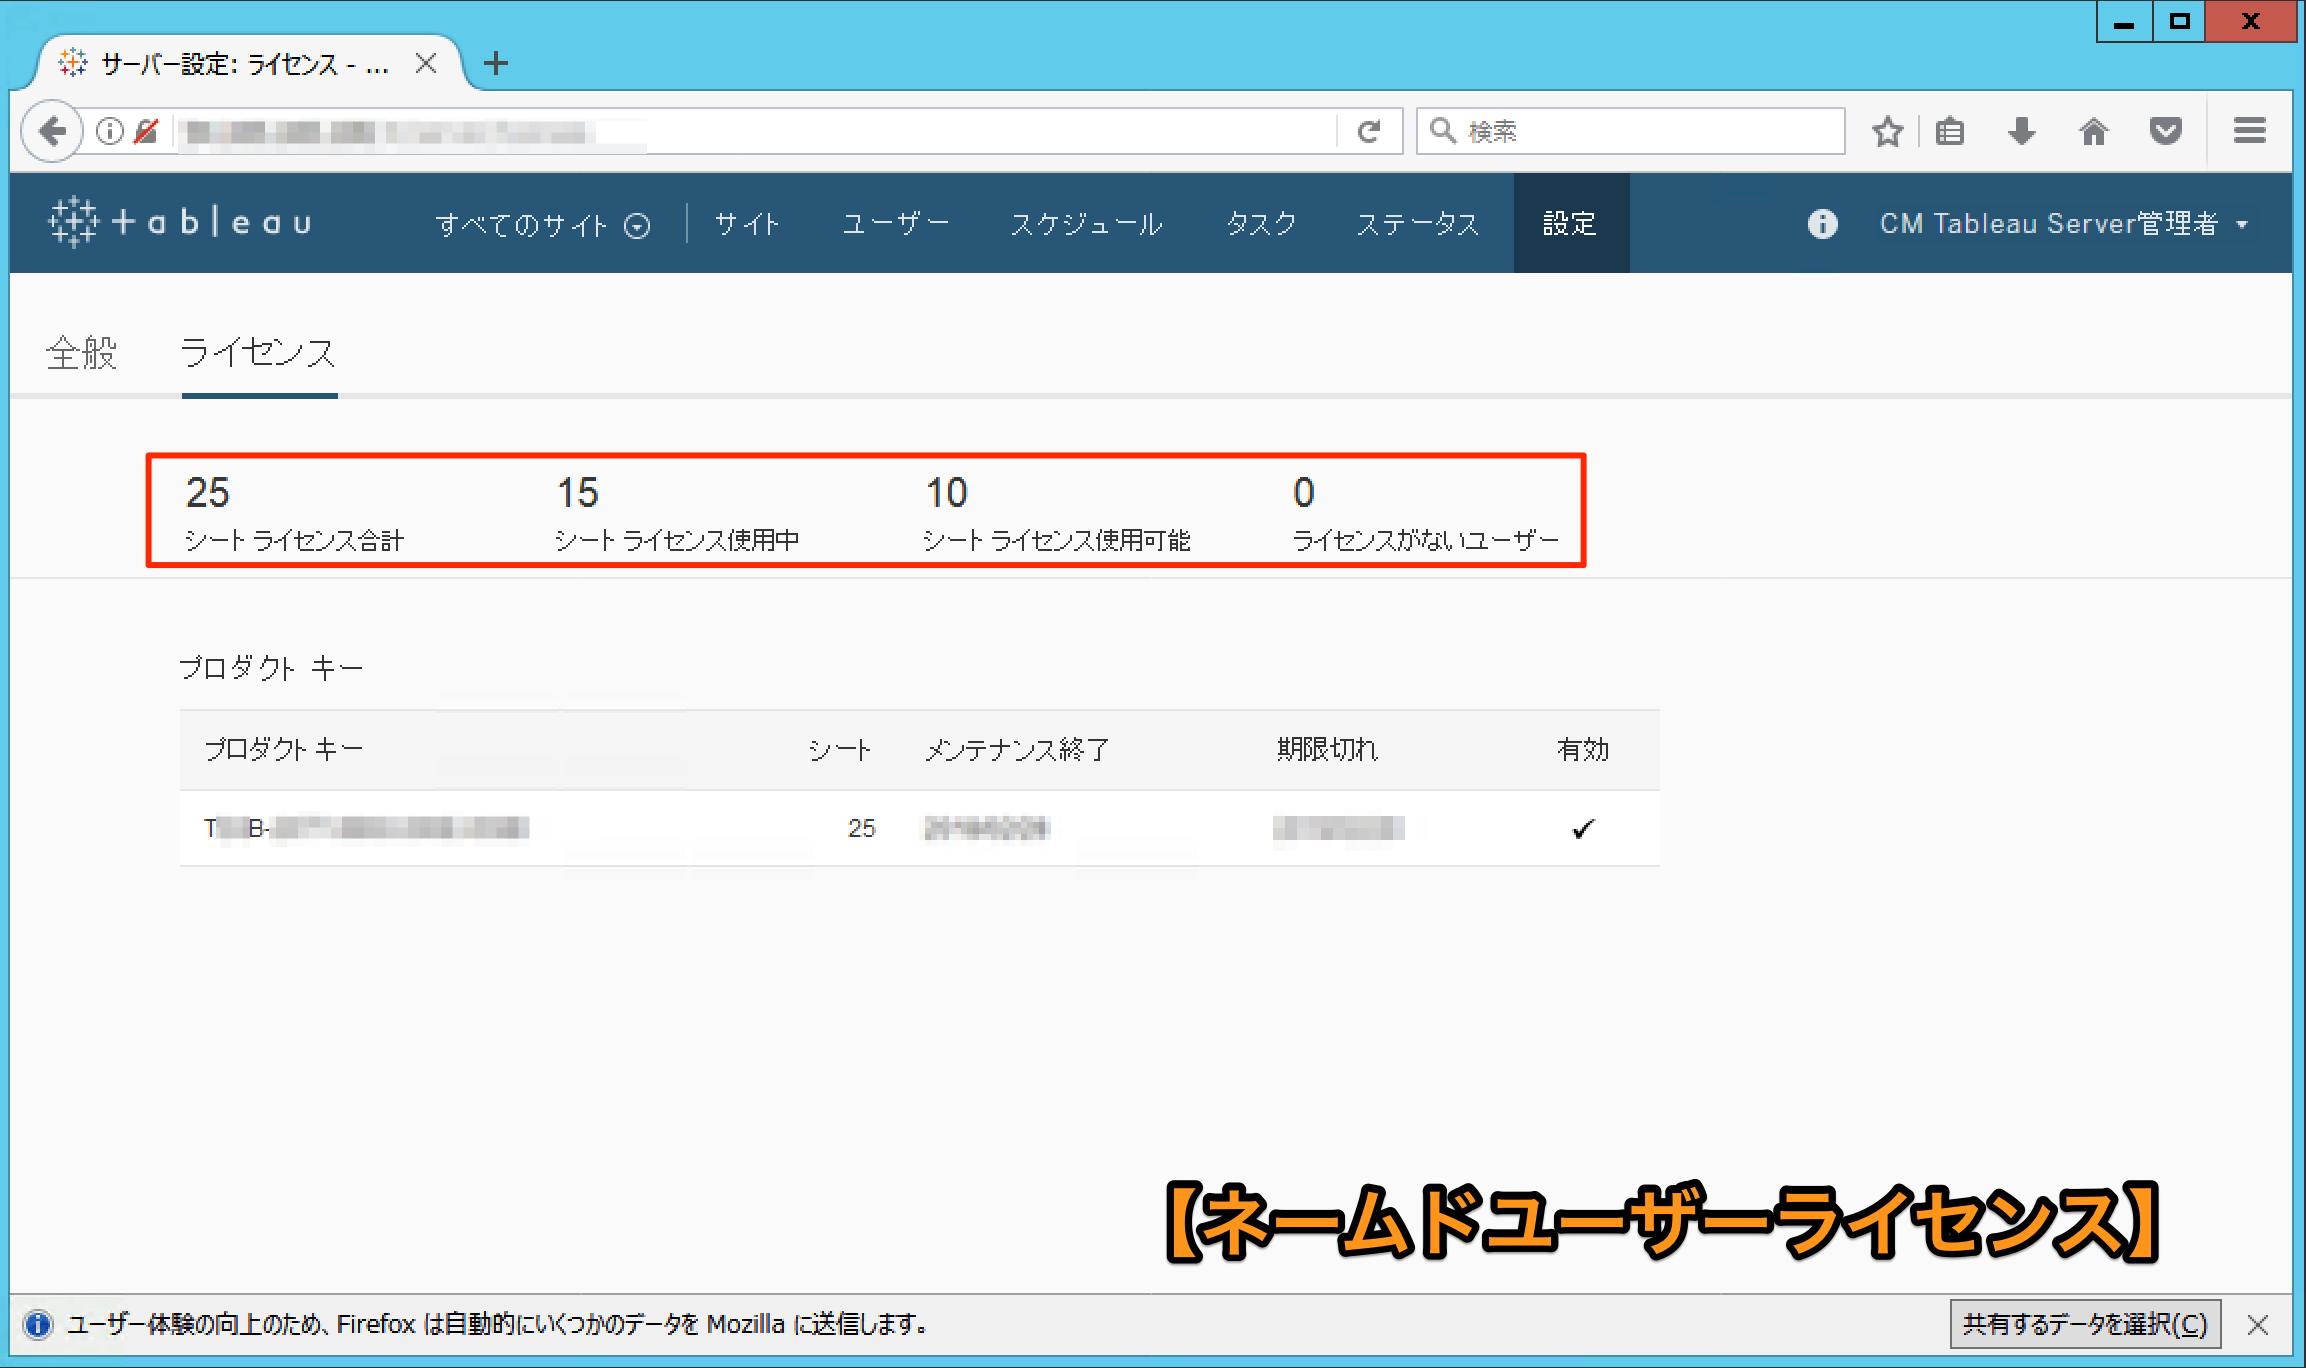 tableau-server-core-lisence-guest-user-option_04